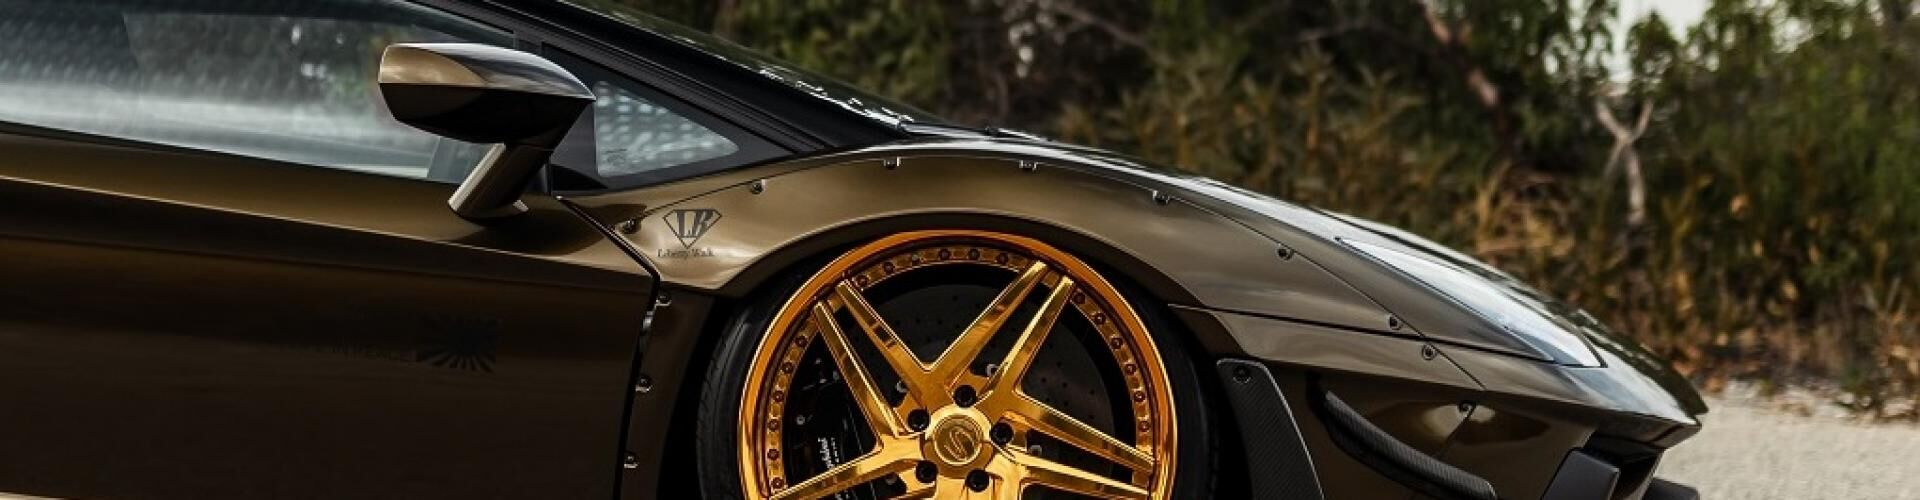 Midnight Gold Supergloss Metallic